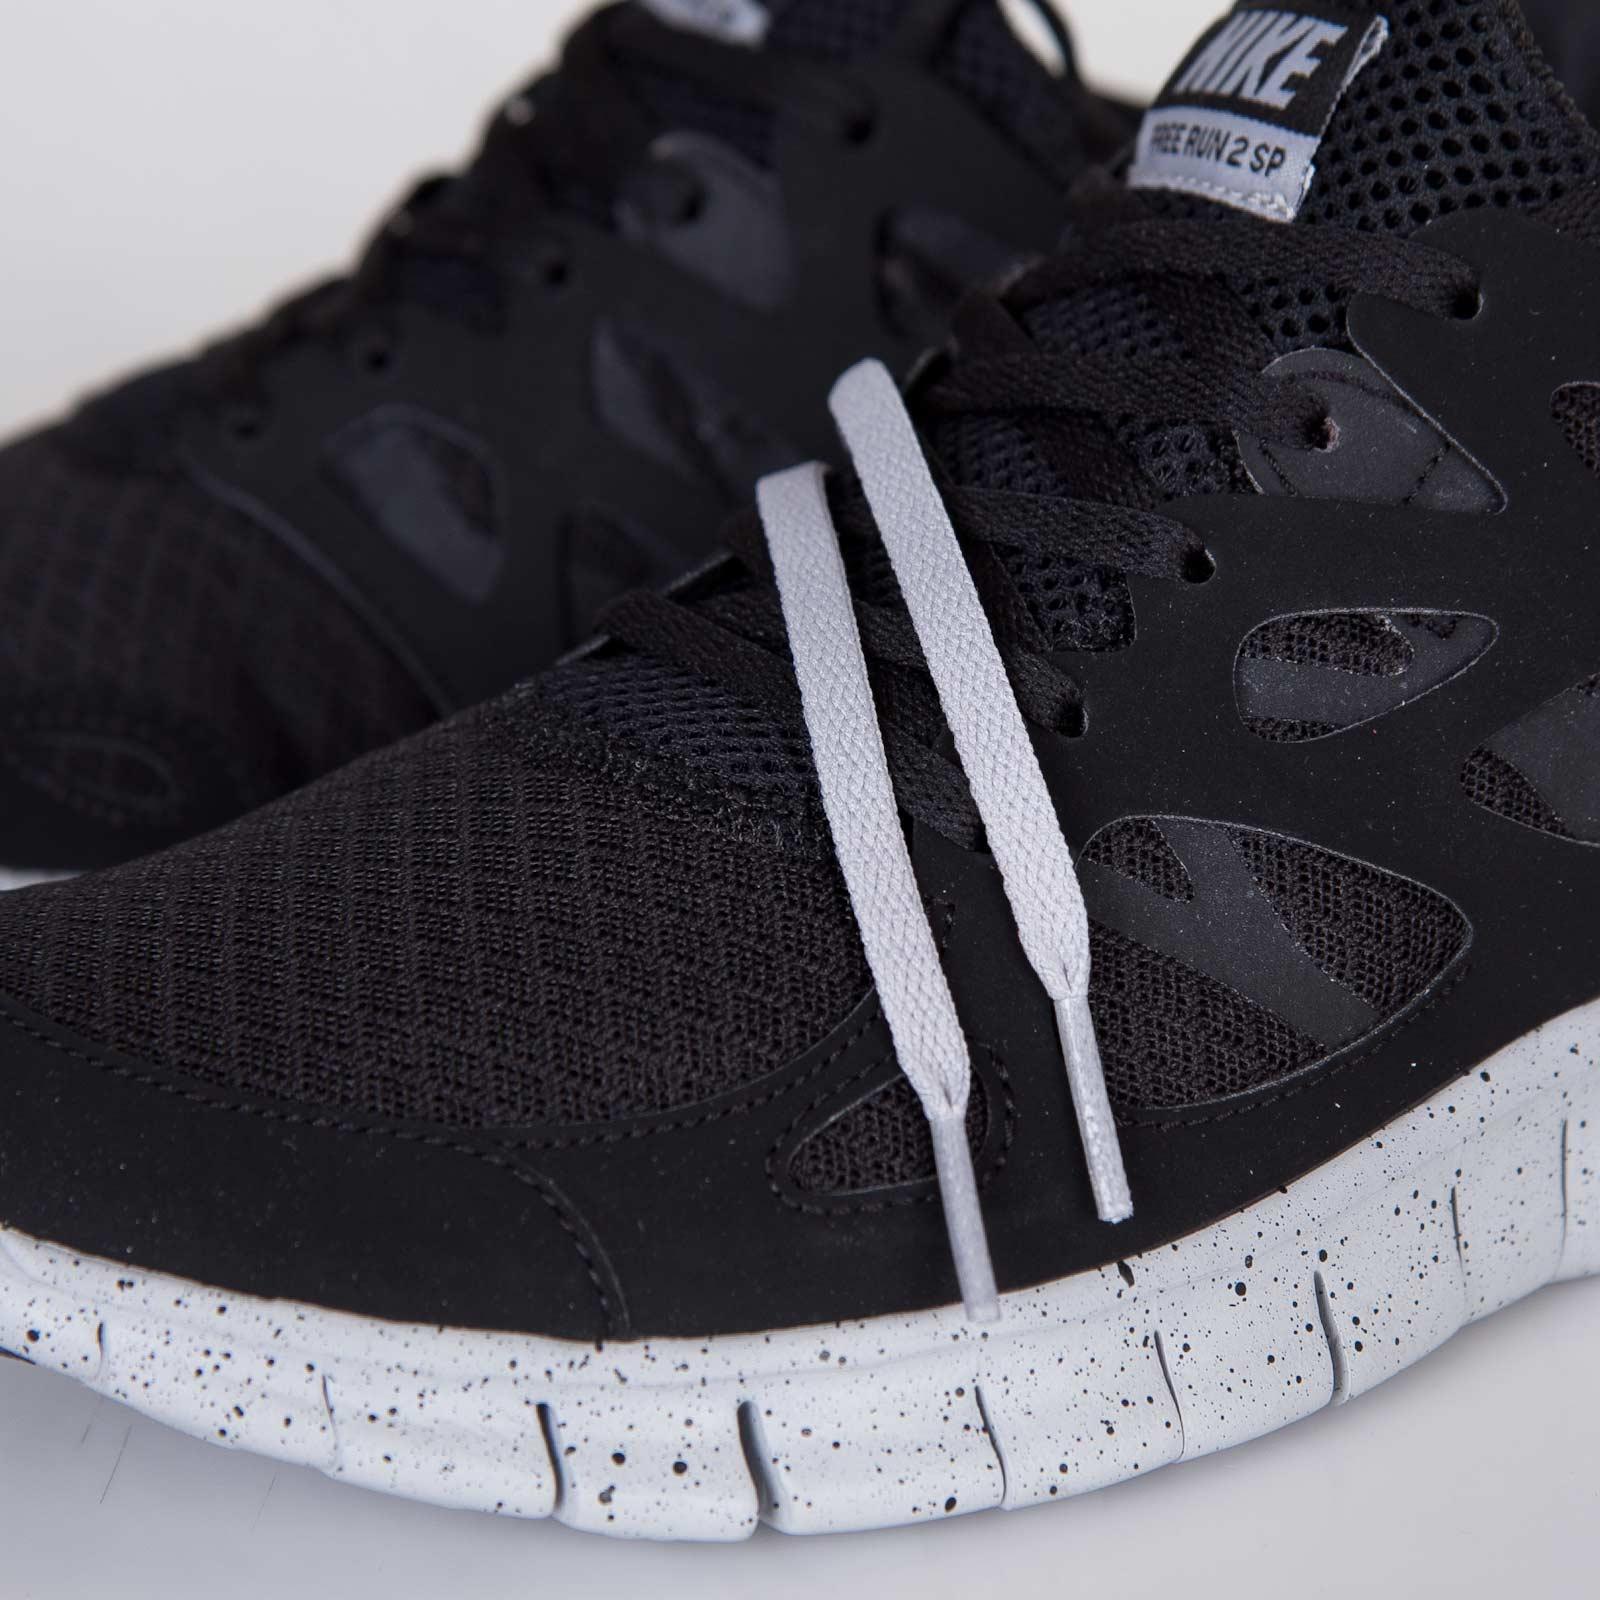 0e143e6b970 Nike Free Run 2 SP - 677736-001 - Sneakersnstuff